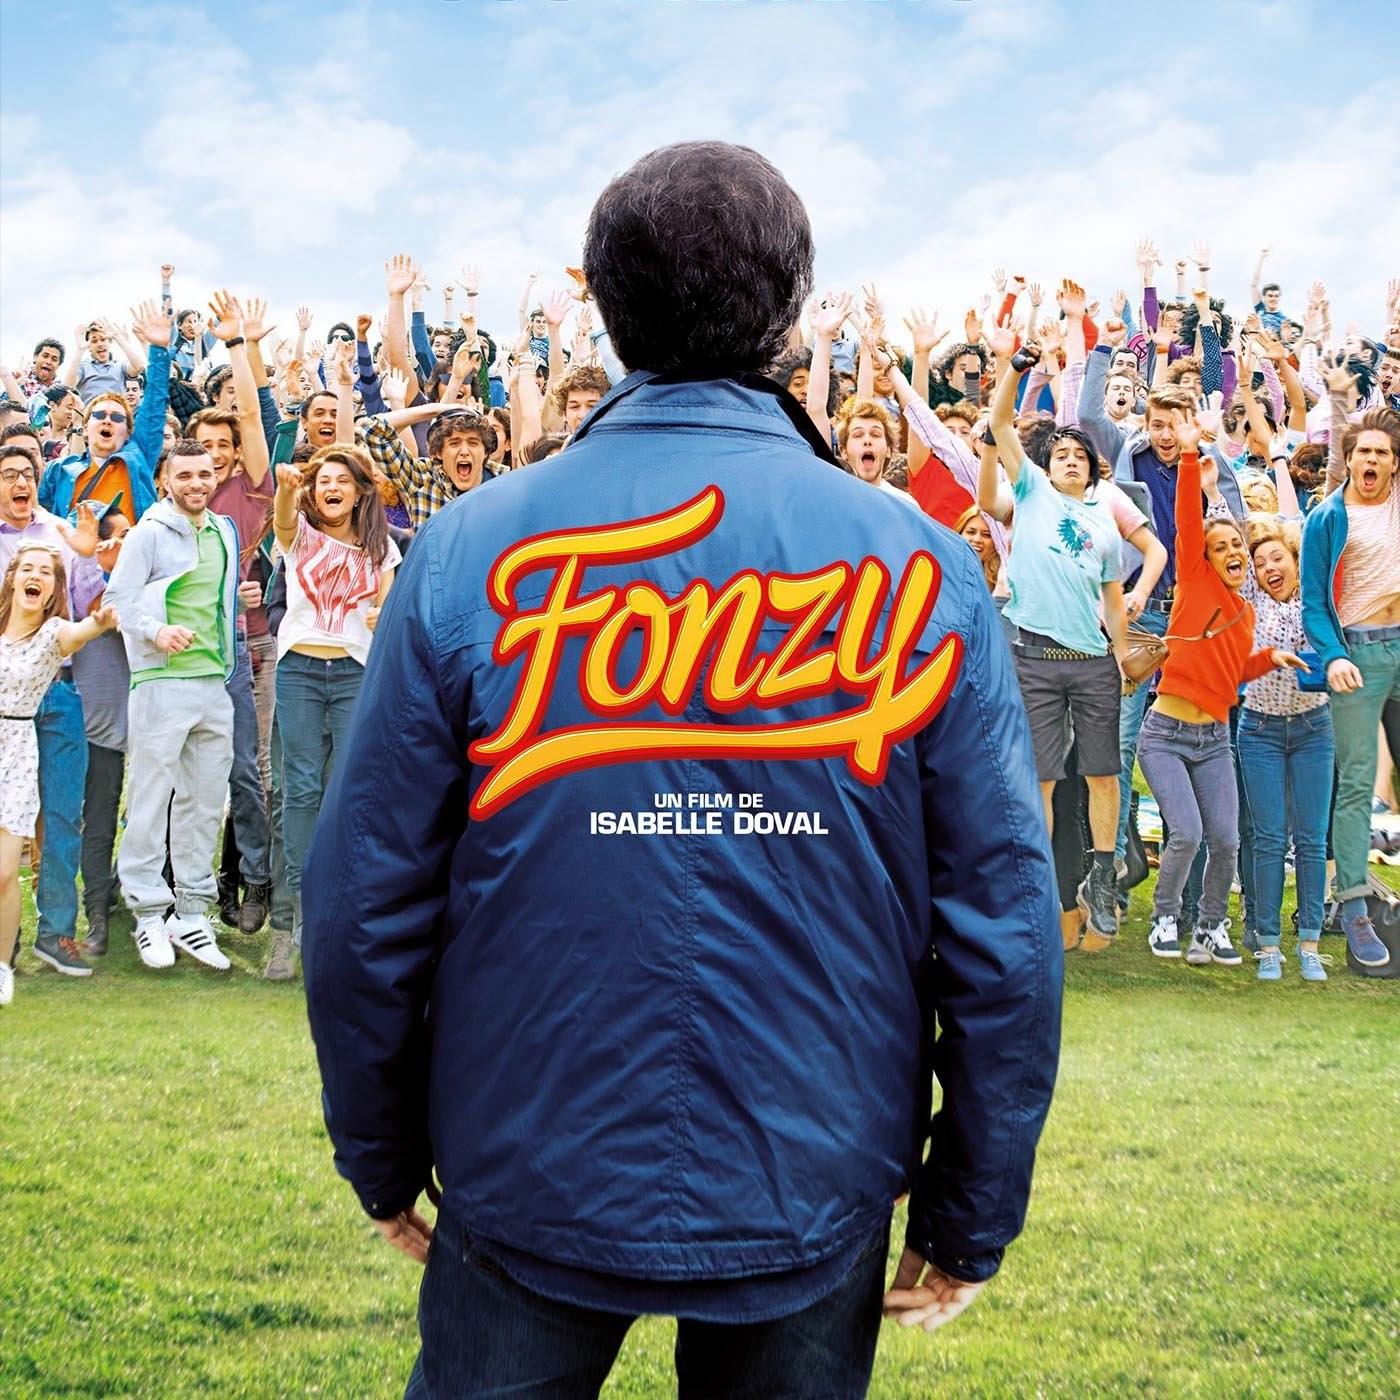 Fonzy : Le rôle sur mesure de José Garcia